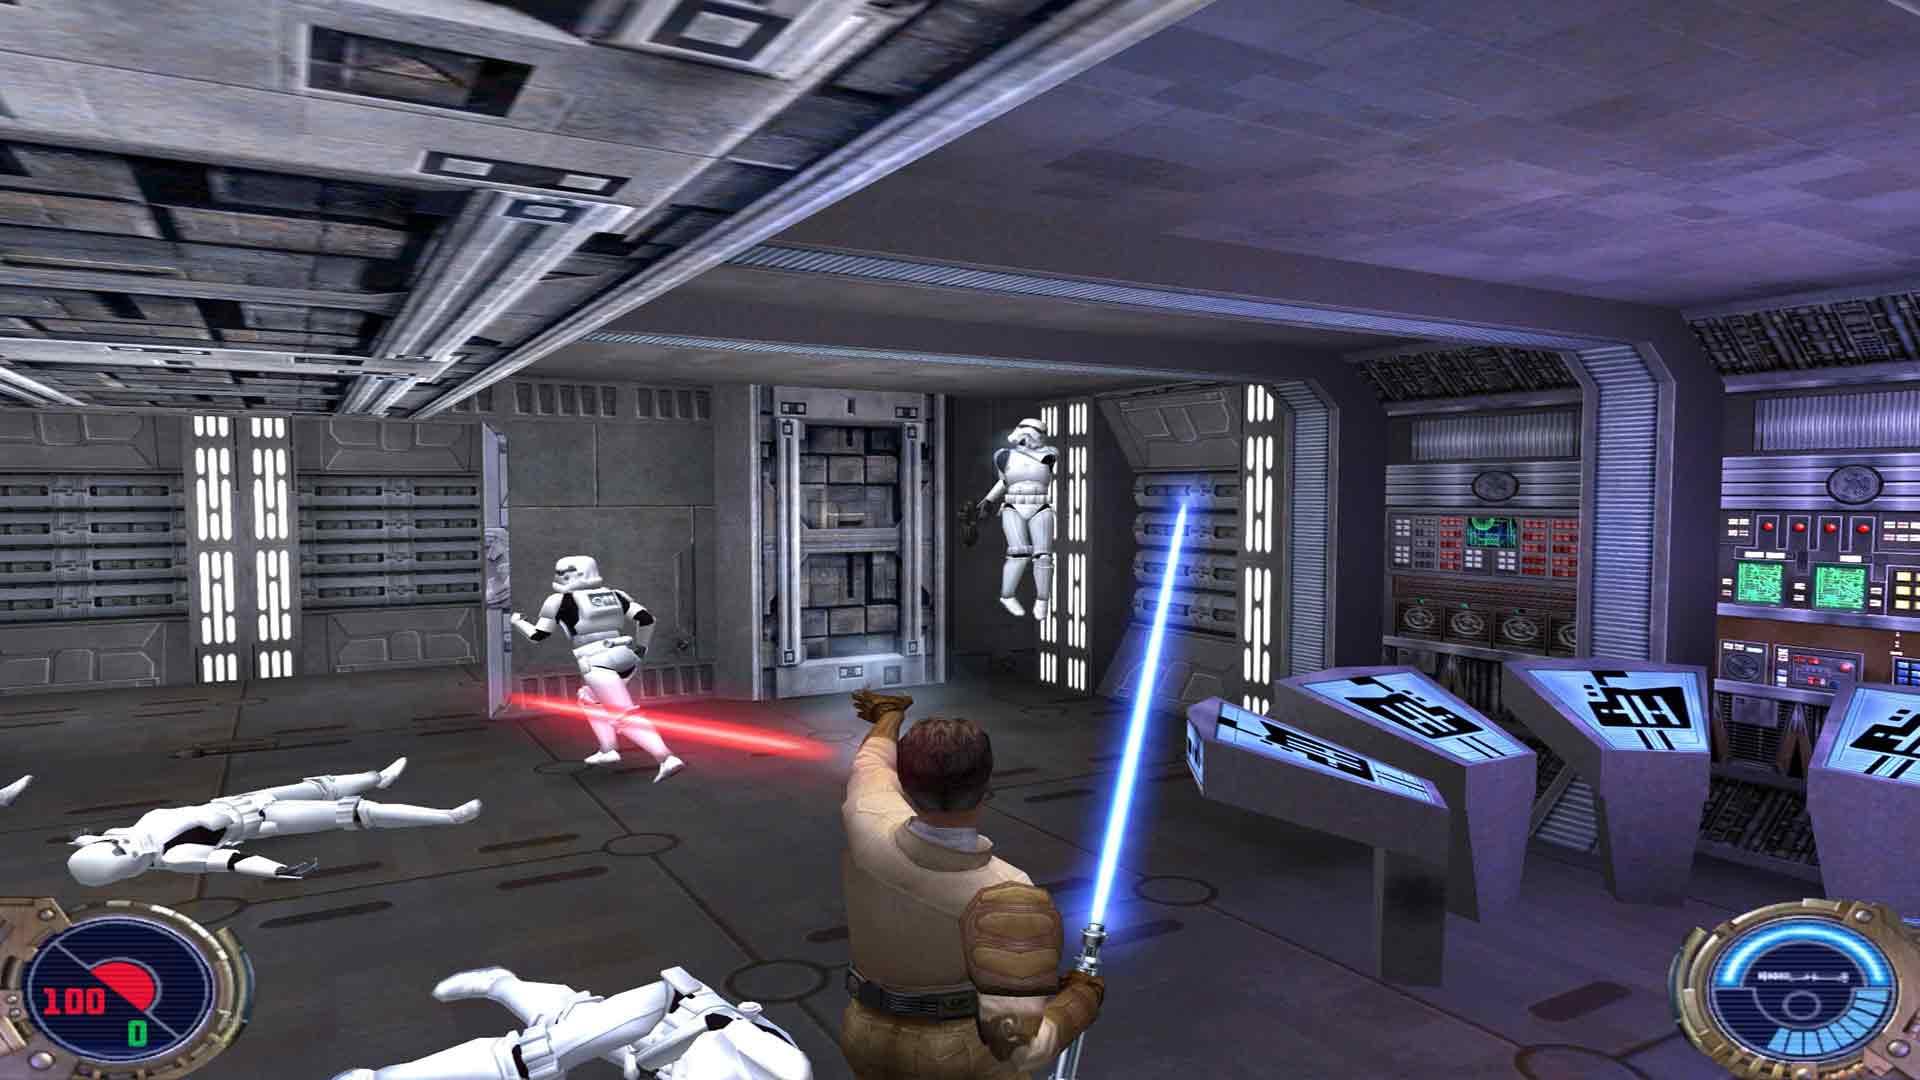 Star Wars Jedi Knight Ii Jedi Outcast Review Gamerheadquarters